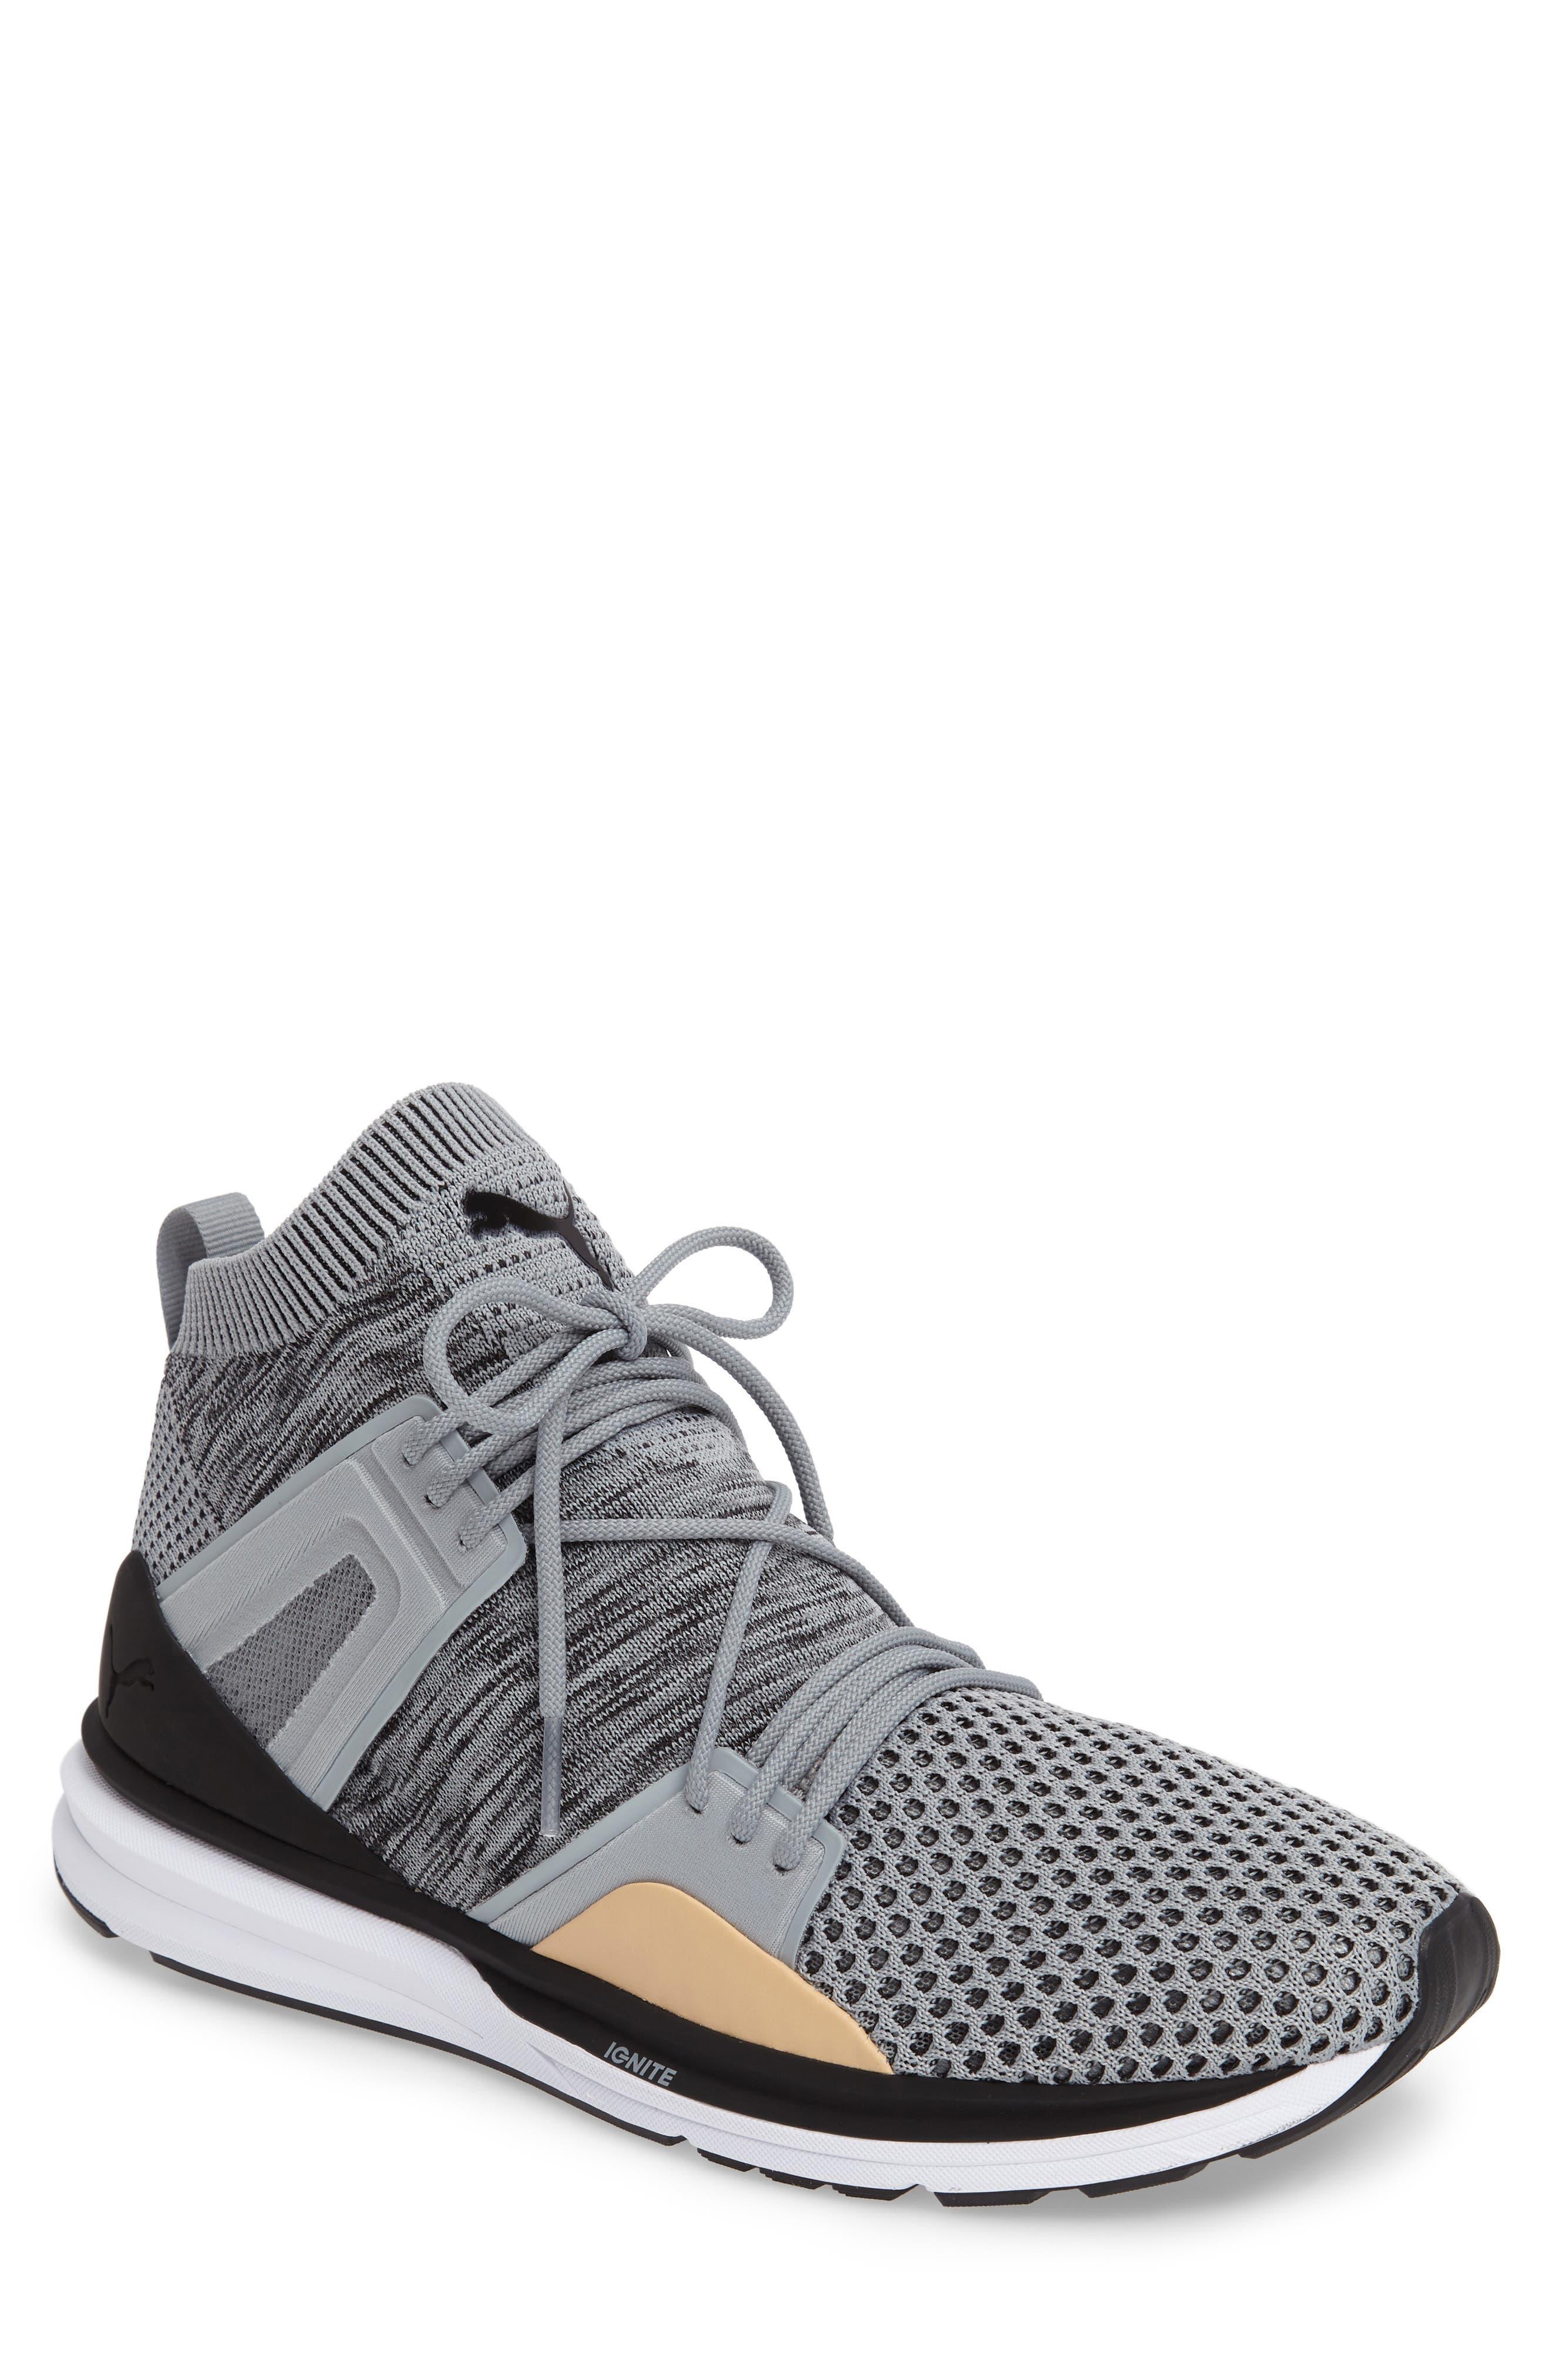 PUMA B.O.G. Limitless Hi evoKNIT Sneaker (Men)